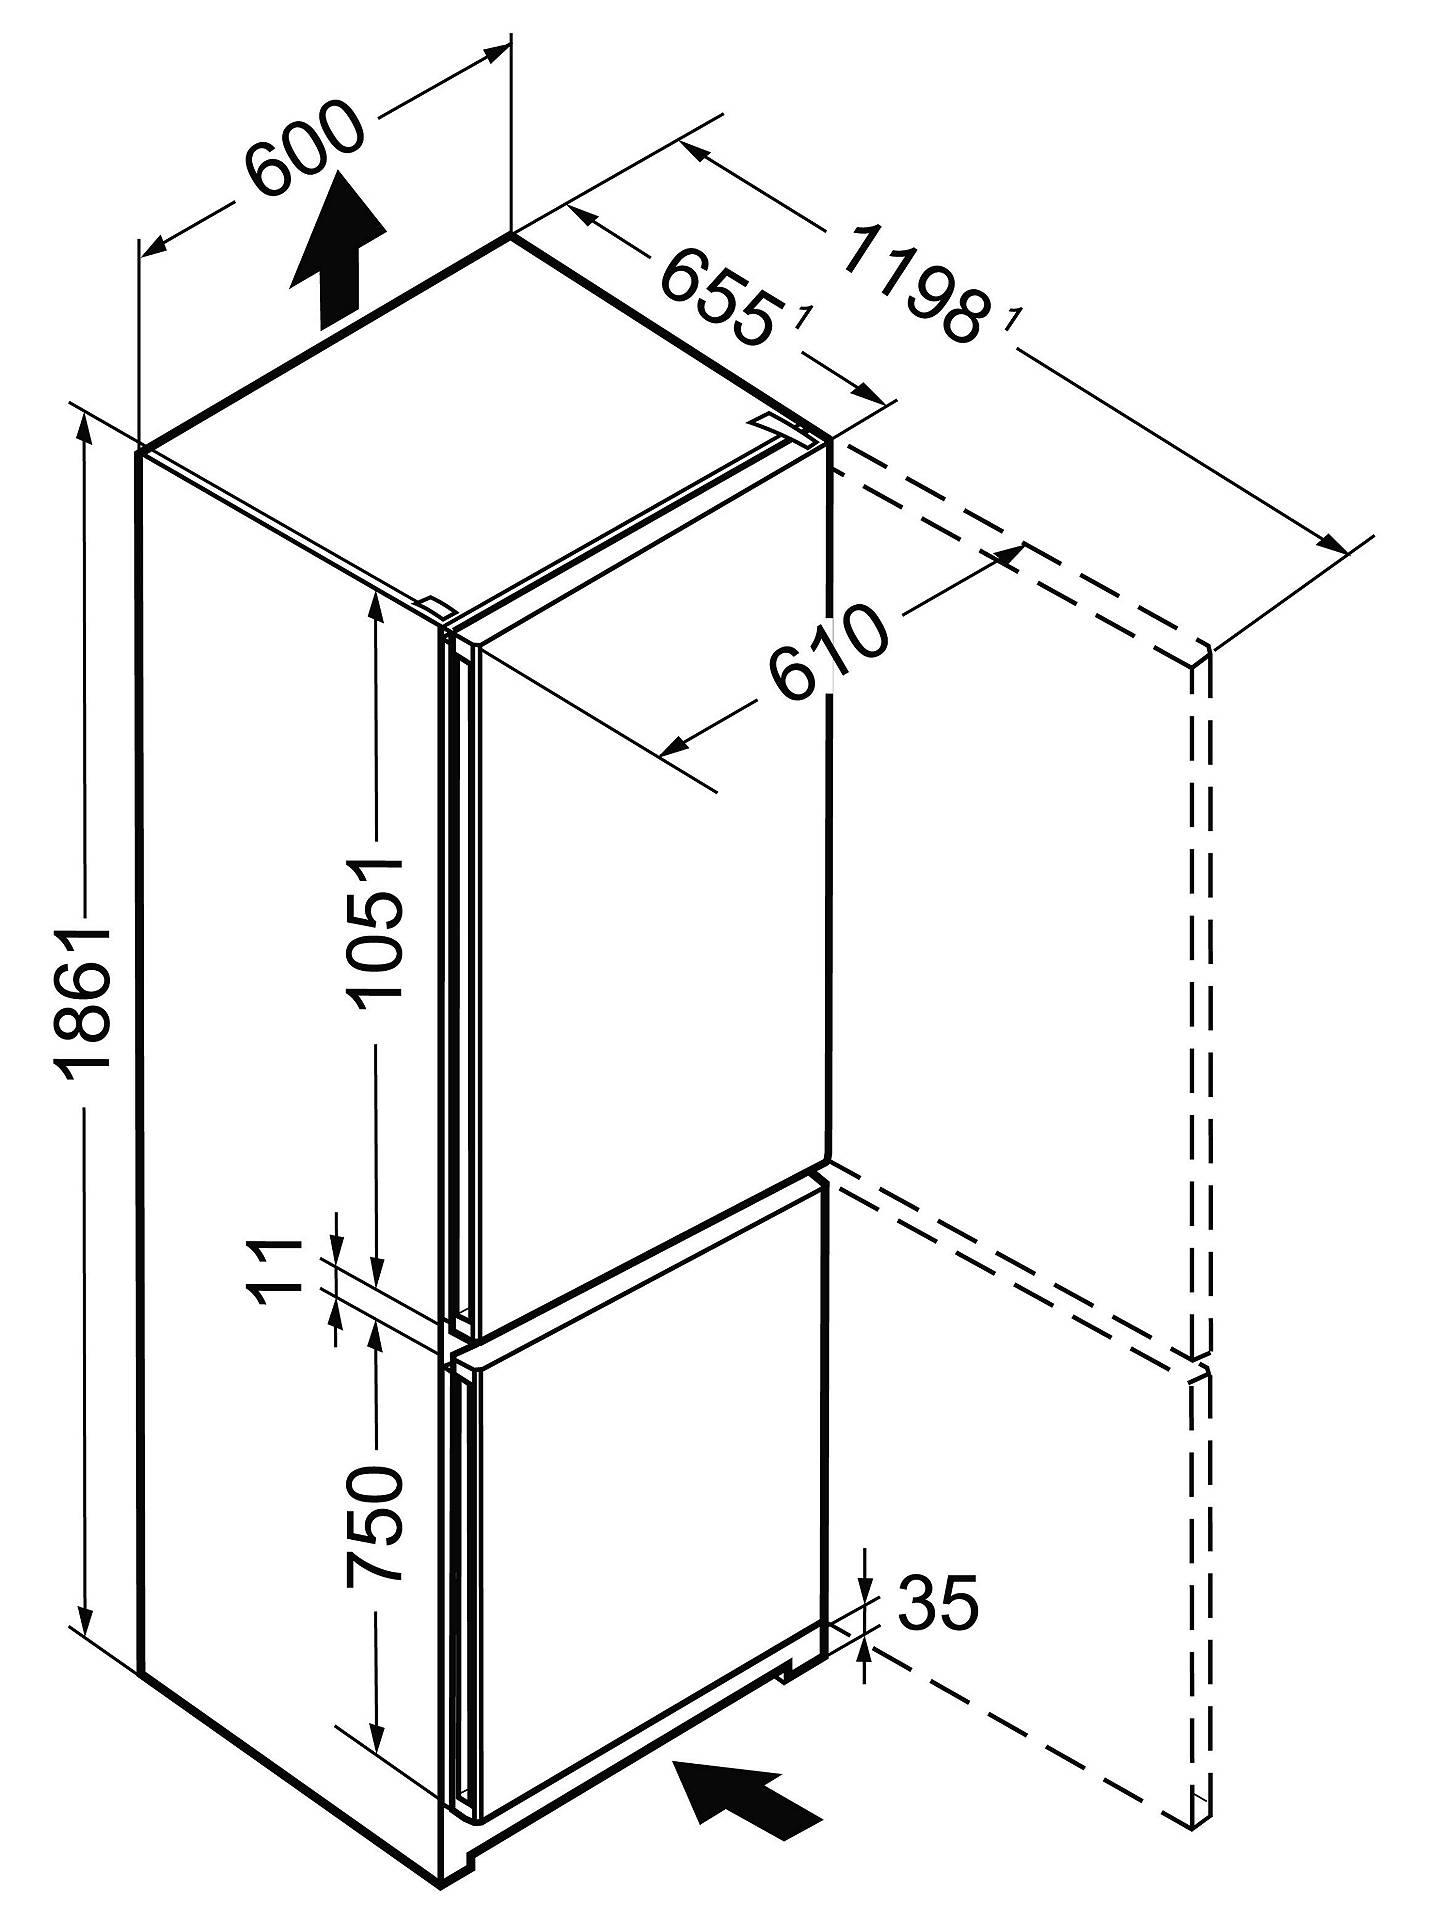 Liebherr CNP4313 Freestanding Fridge Freezer, A+++ Energy Rating, 60cm  Wide, White